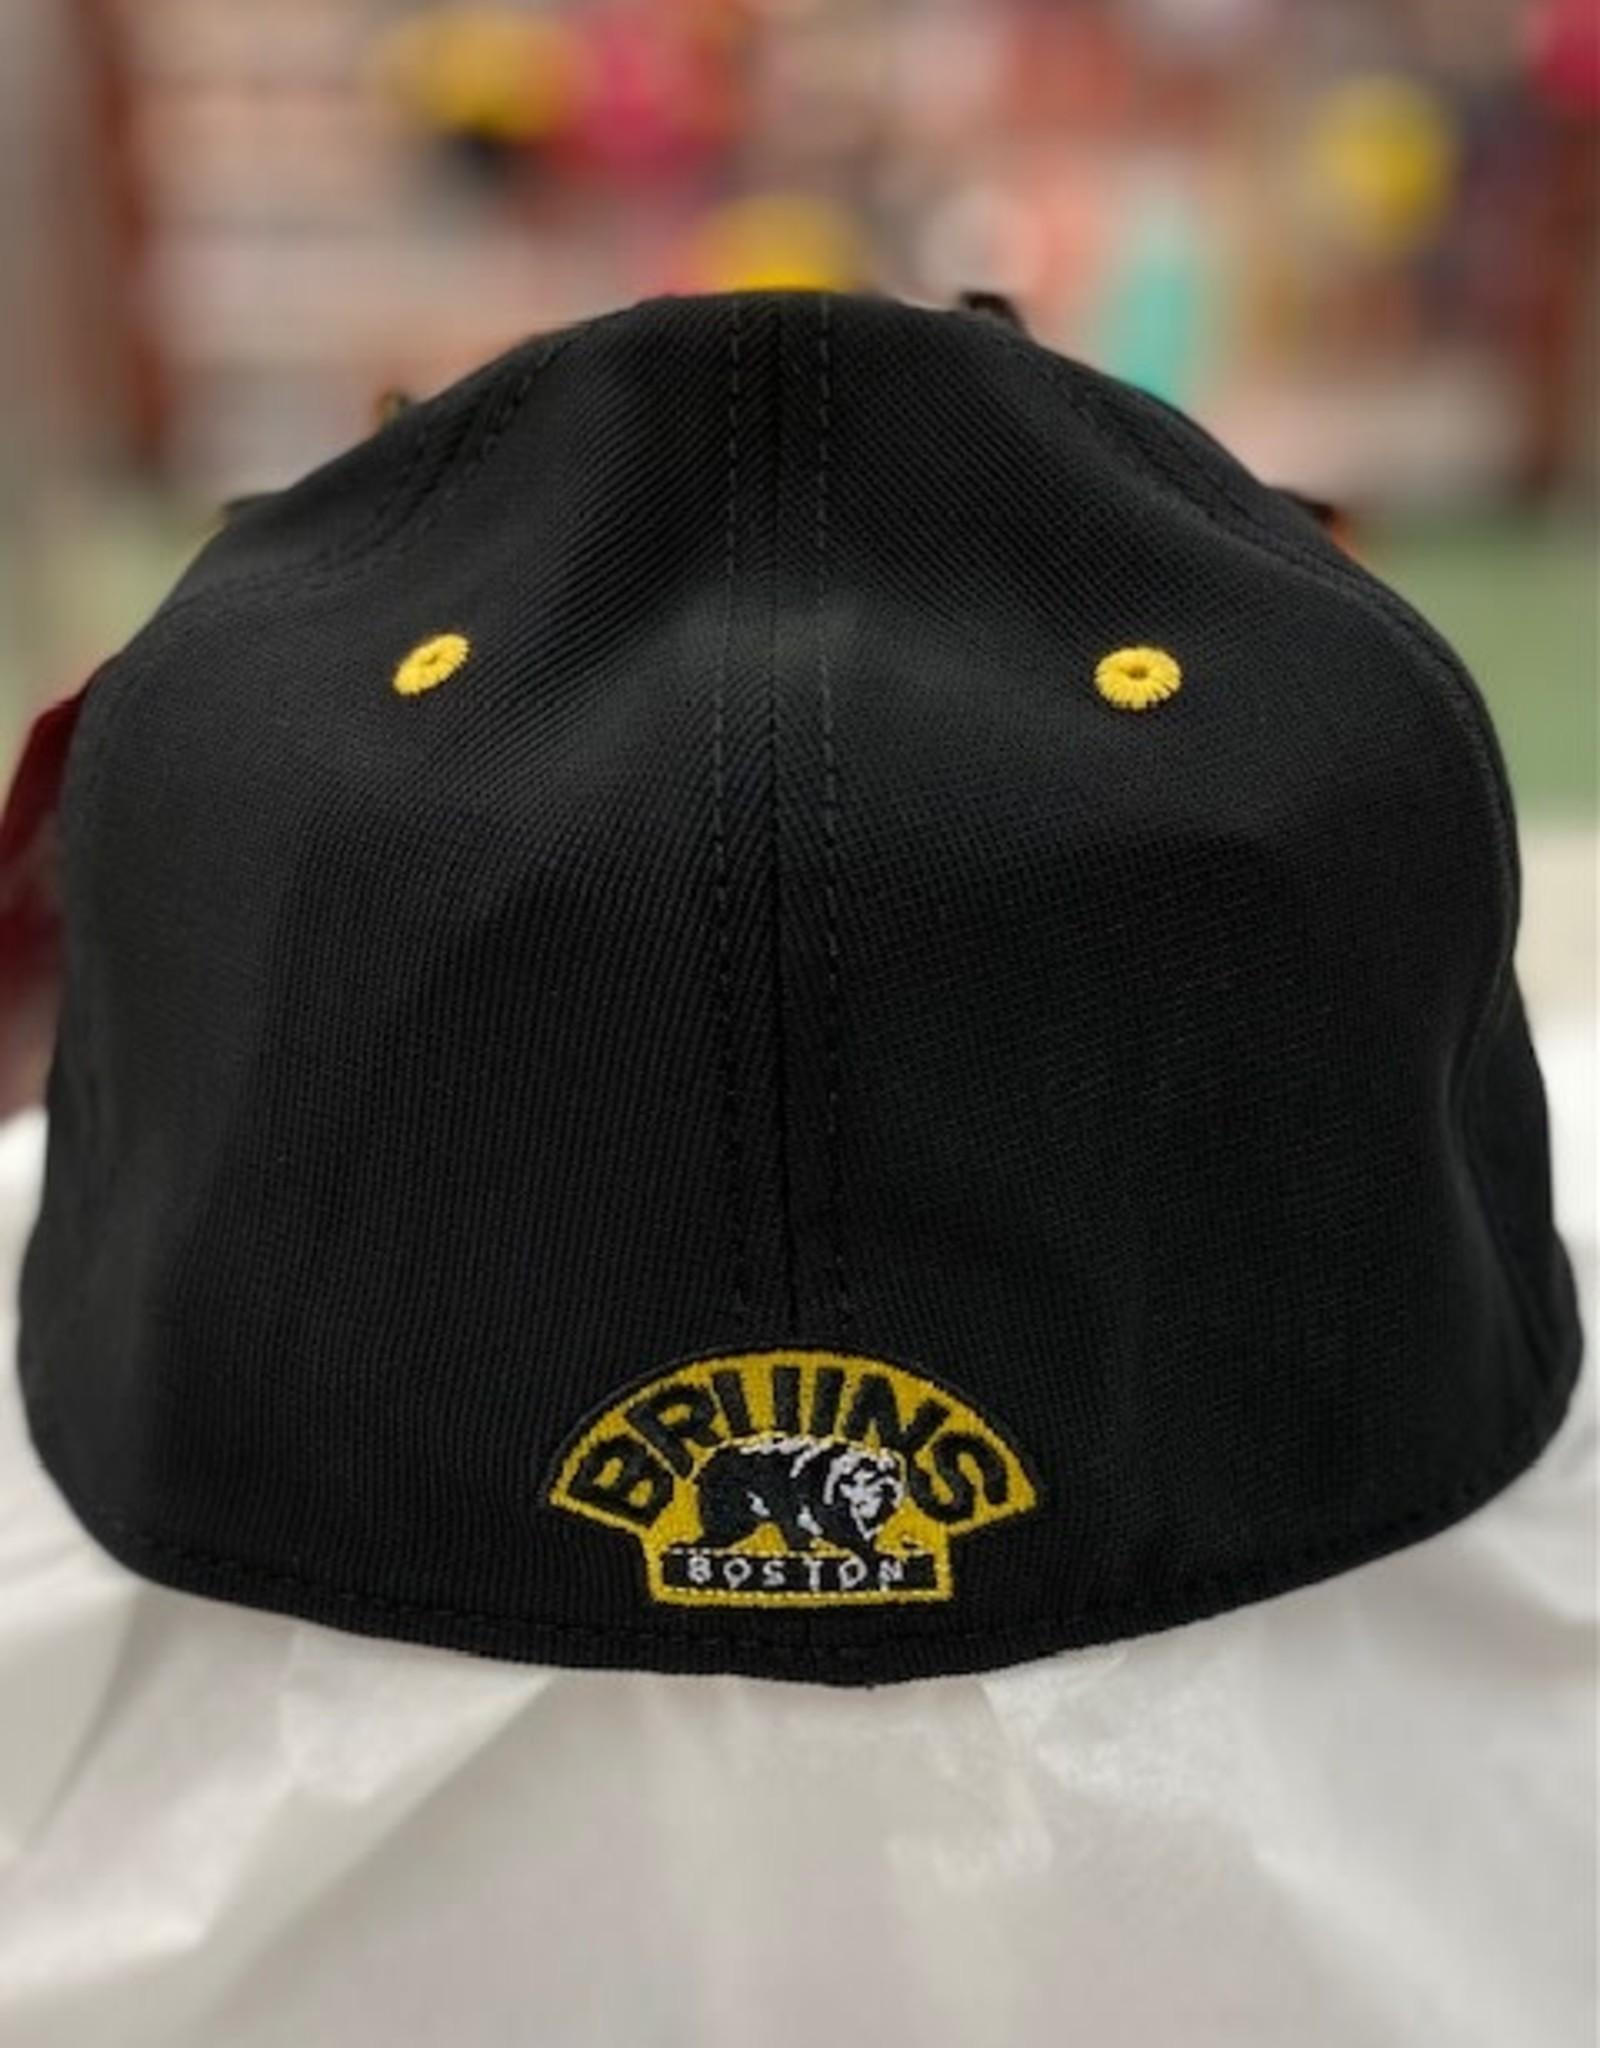 American Needle American Needle Men's E Boss Stretch Fit Hat Boston Bruins Black